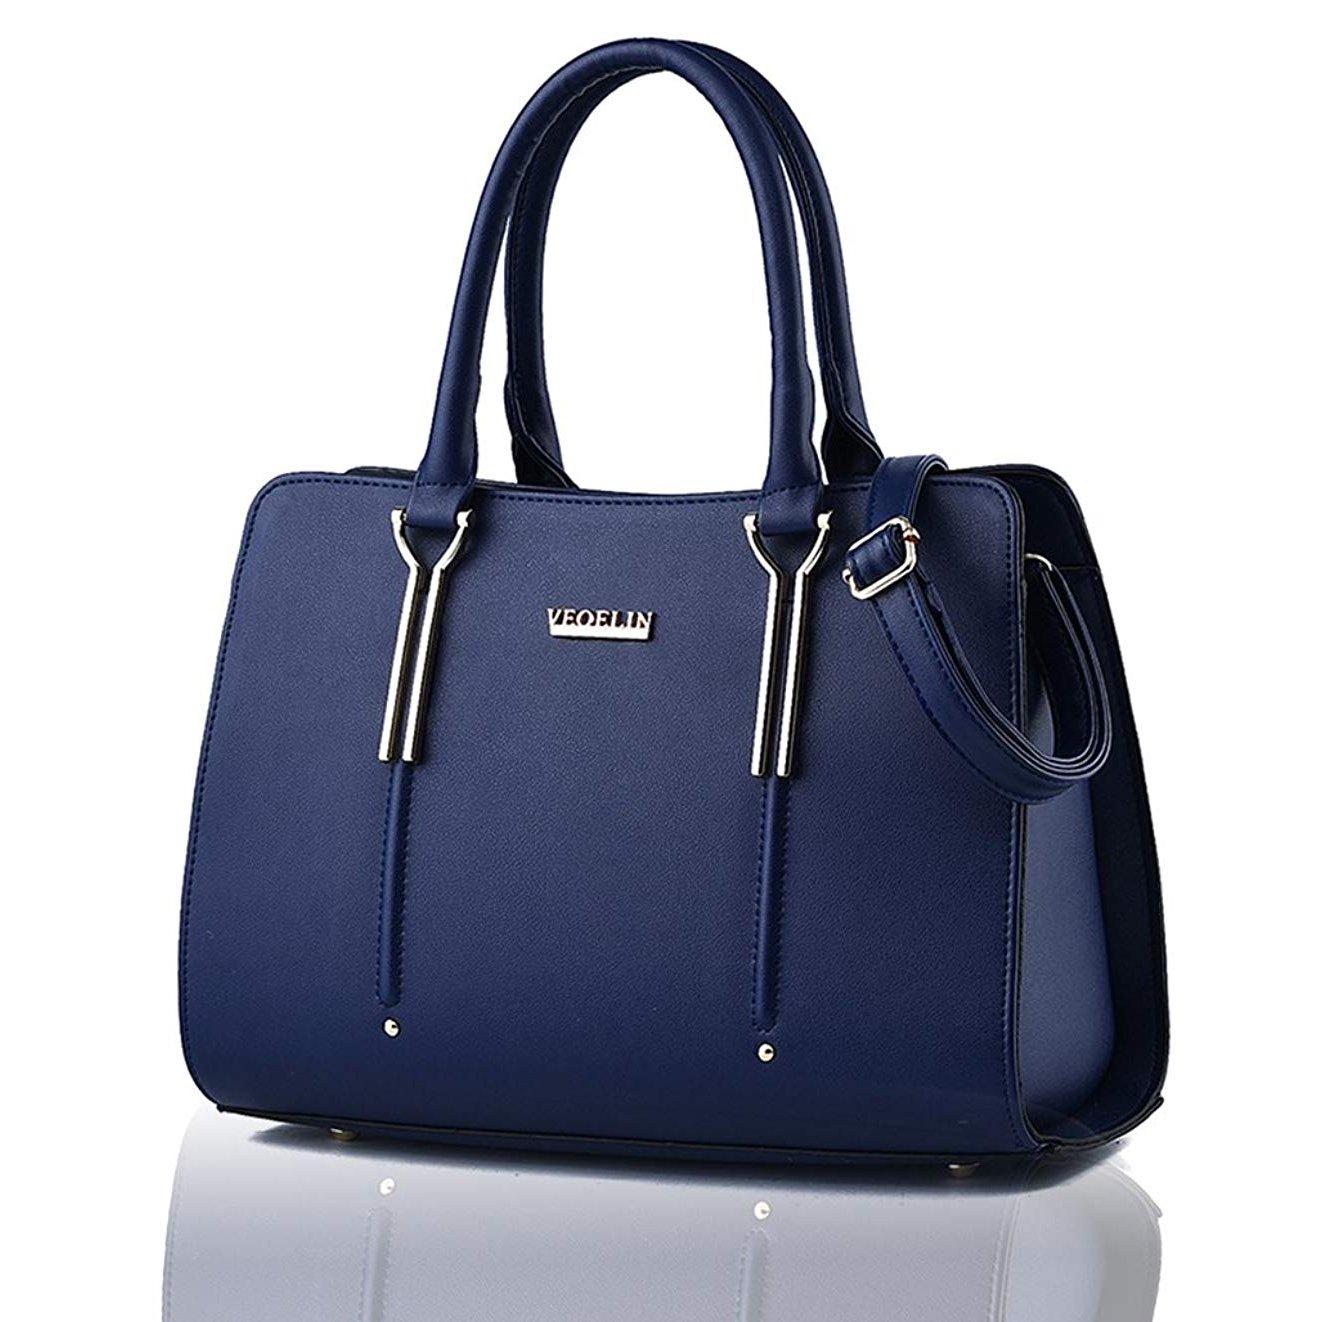 PU Leather Handbags for Women Soft Leather Purse Large Hobo Handbag Shoulder Bag Fashion Top handle (Dark blue)